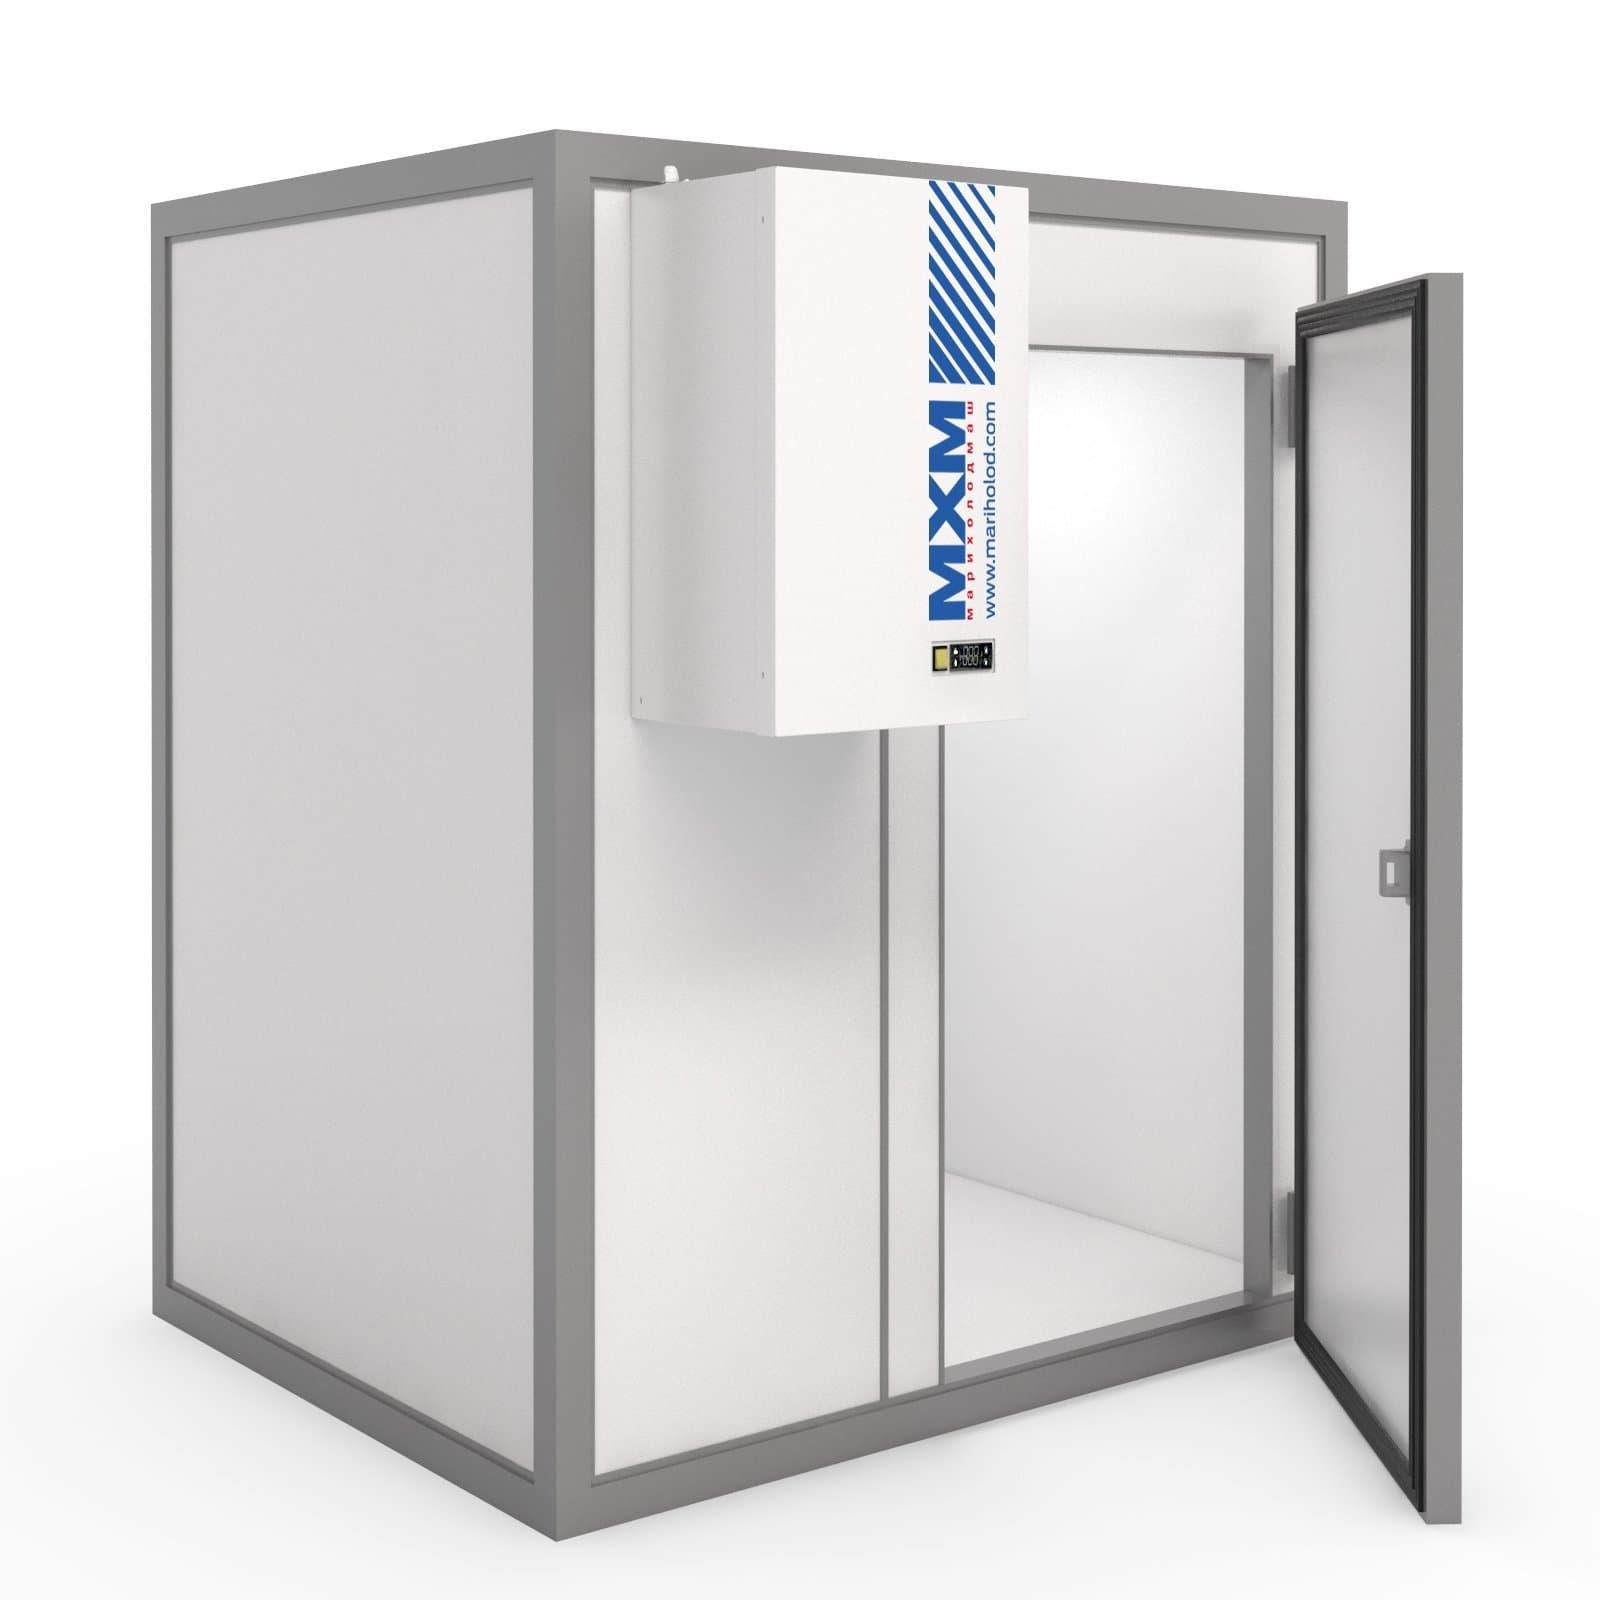 Камера холодильная МХМ КХН-24,19 2260×4660×2720